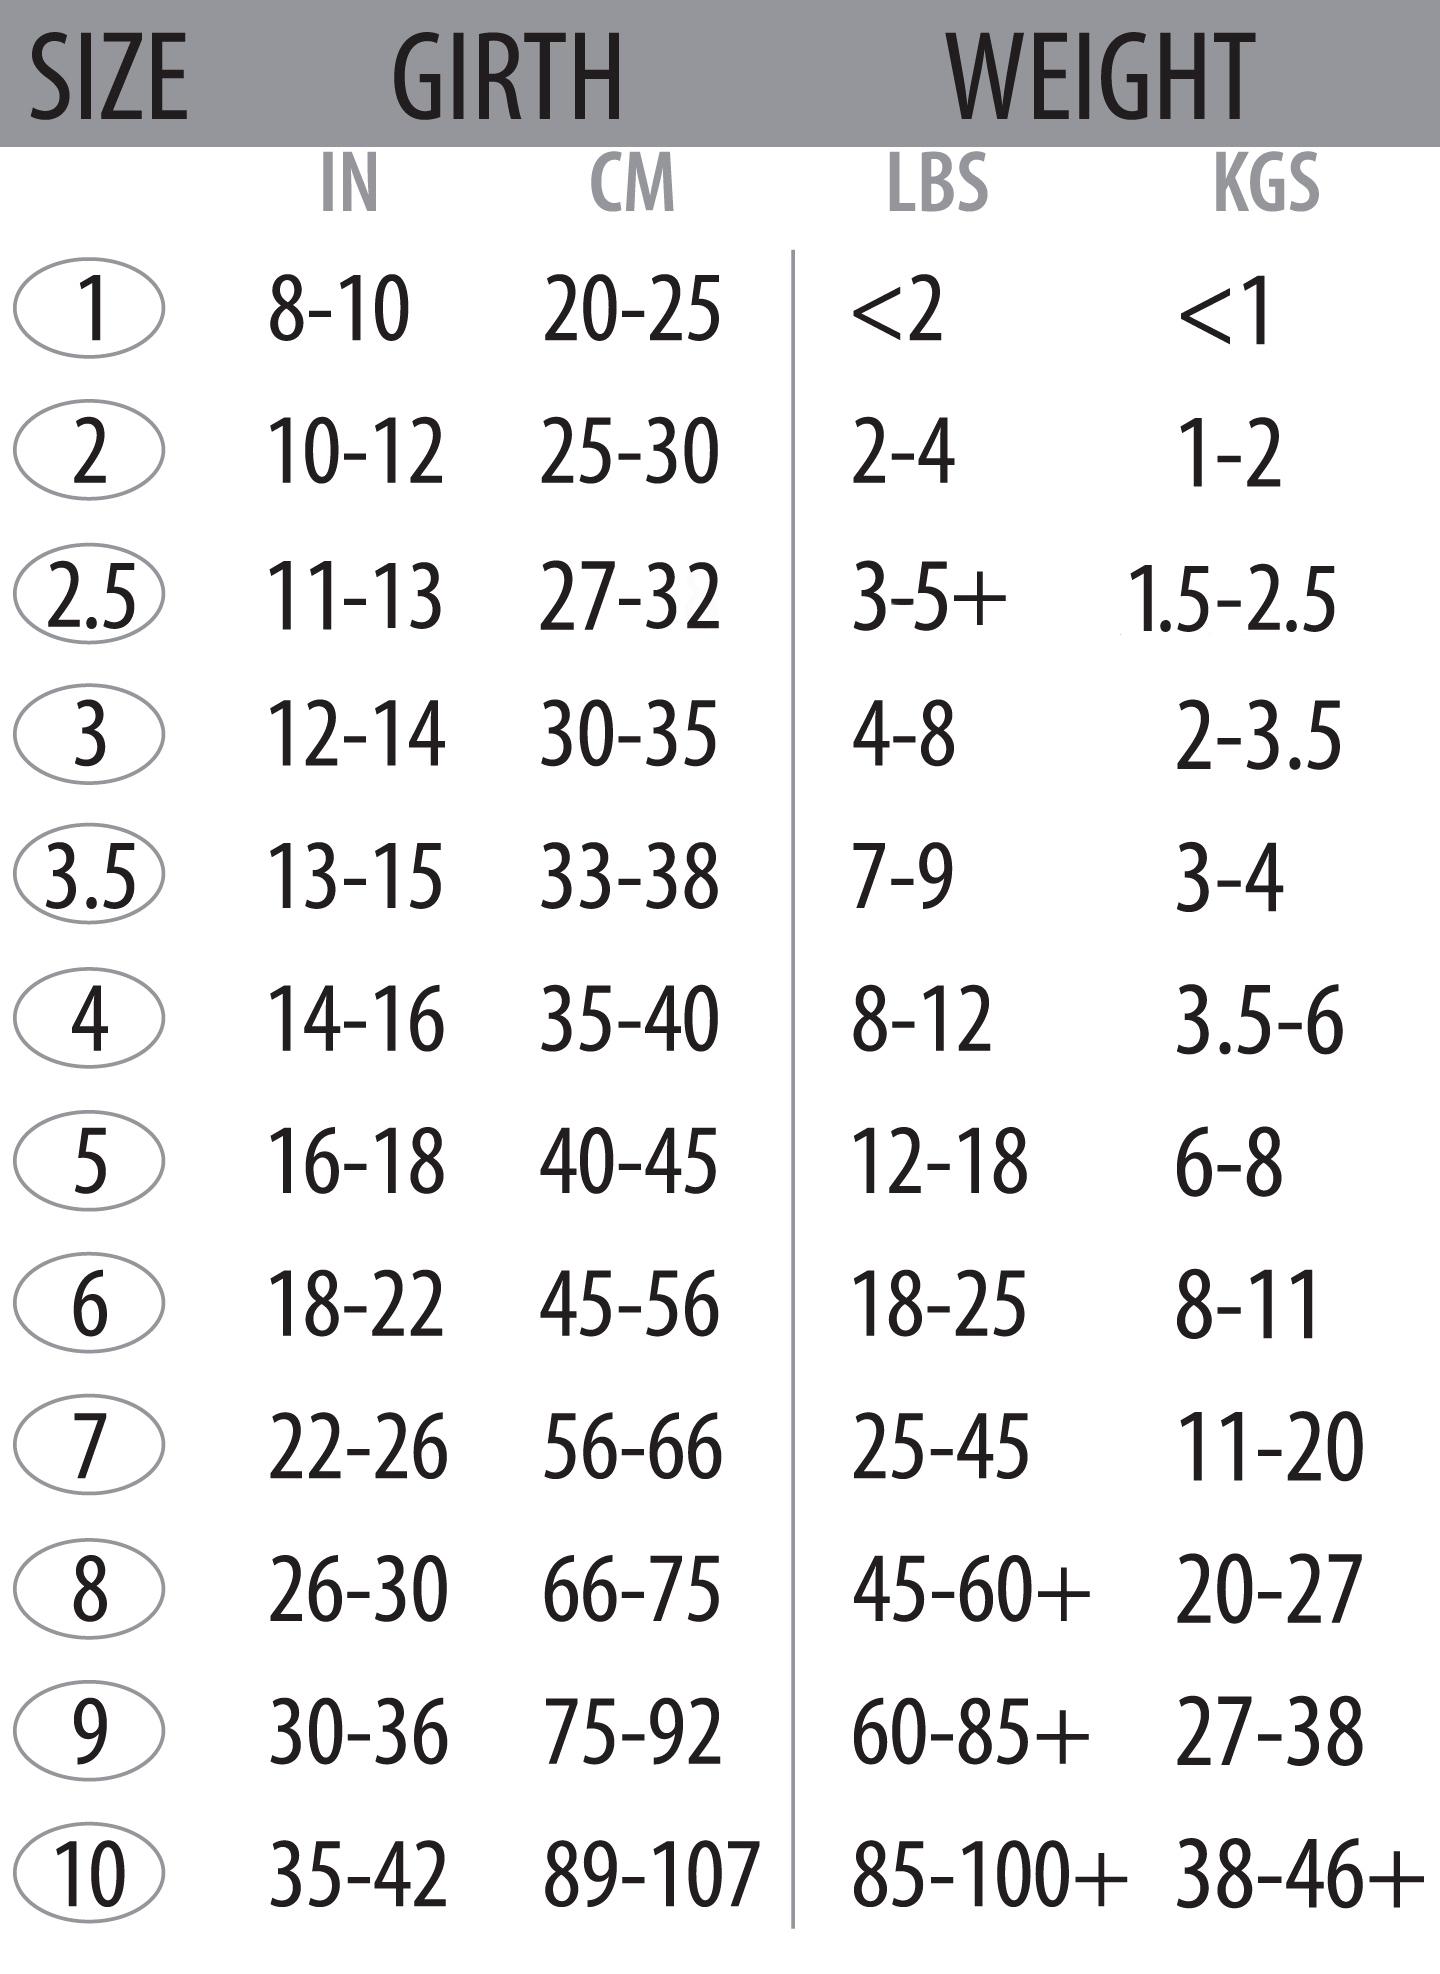 bb-sizing-chart-1-10.png